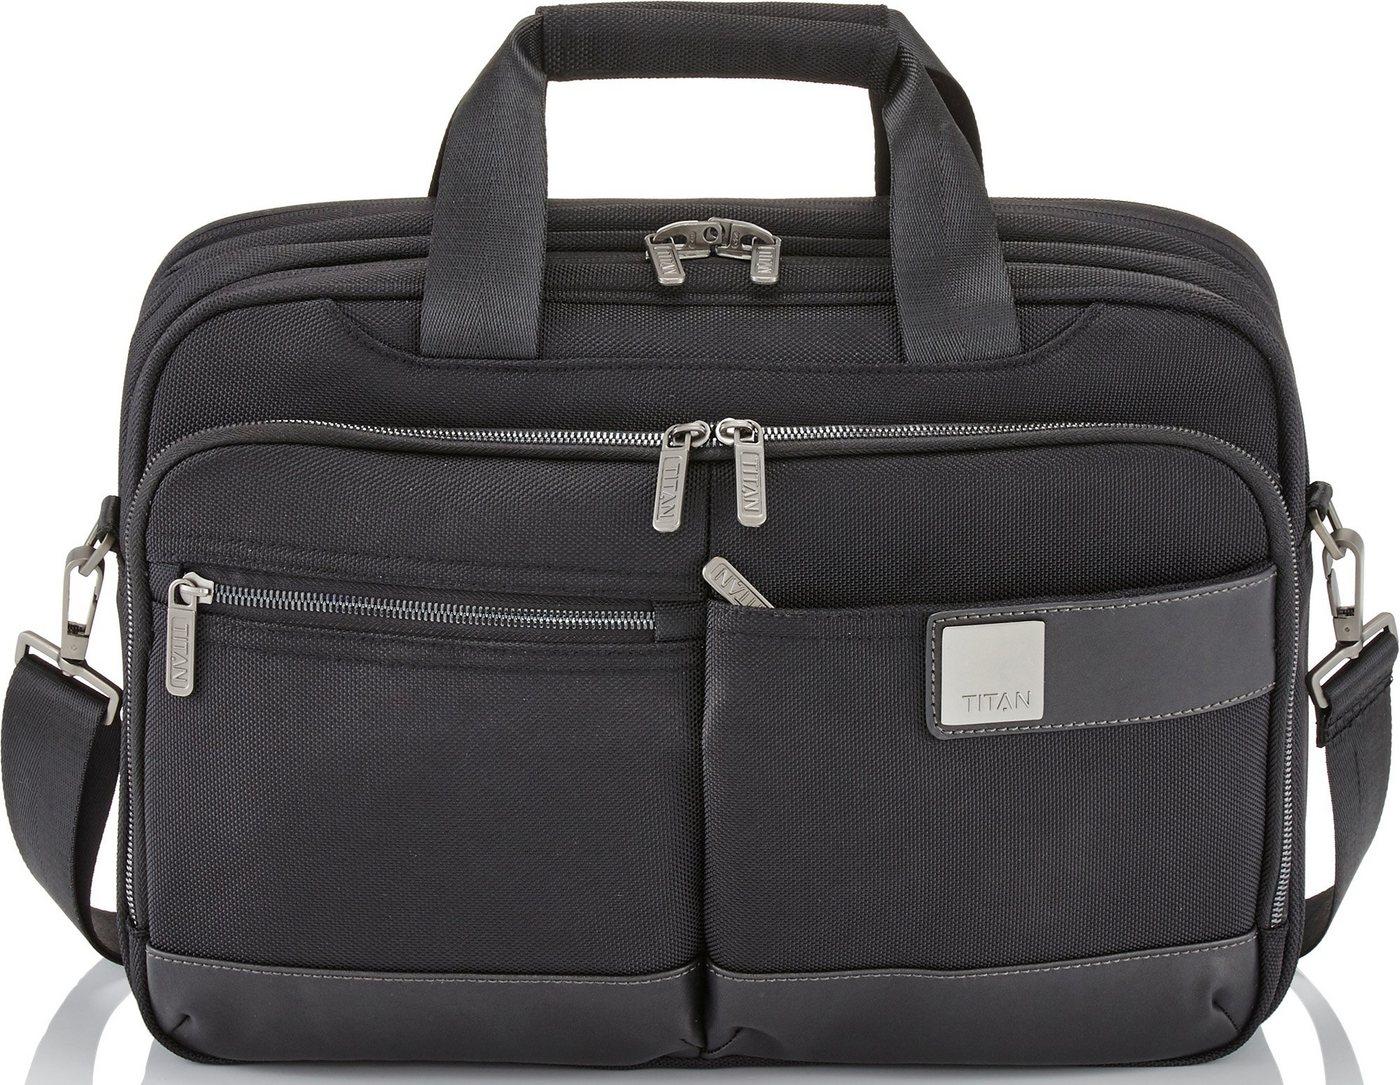 TITAN® Businesstasche »PowerPack S«, mit Laptopfach | Taschen > Businesstaschen | Schwarz | TITAN®